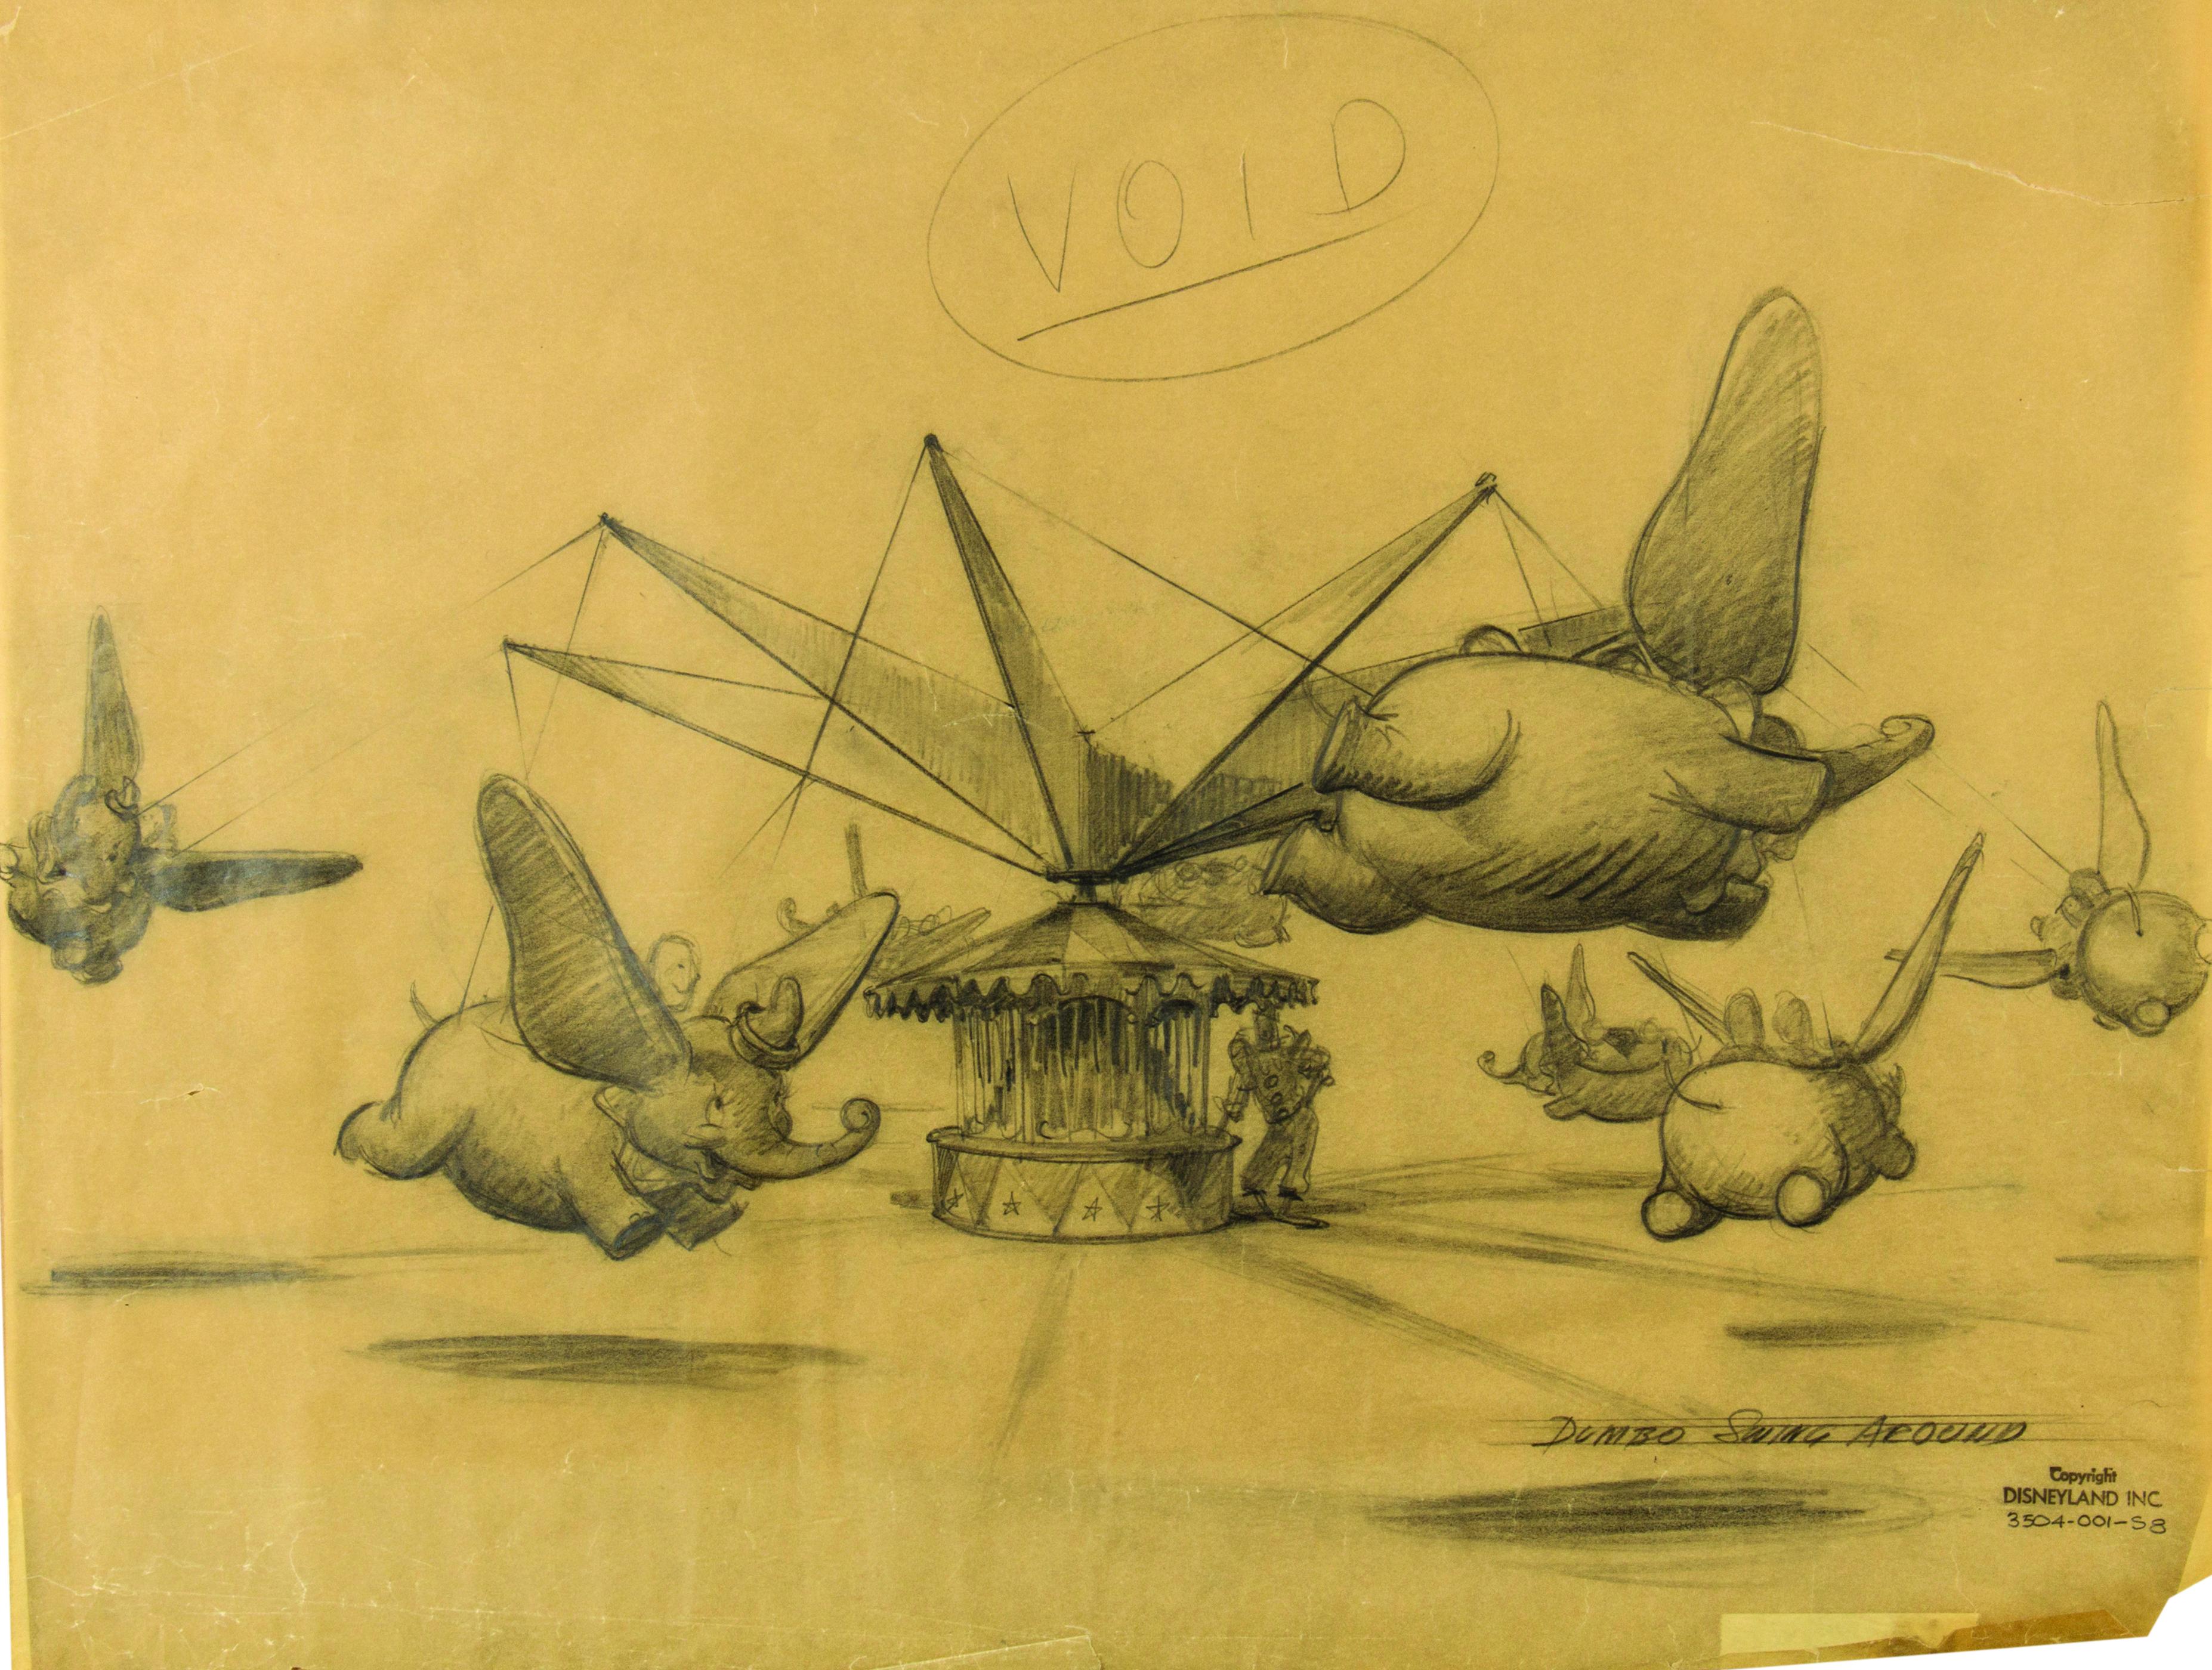 Dumbo Swing-Around concept drawing